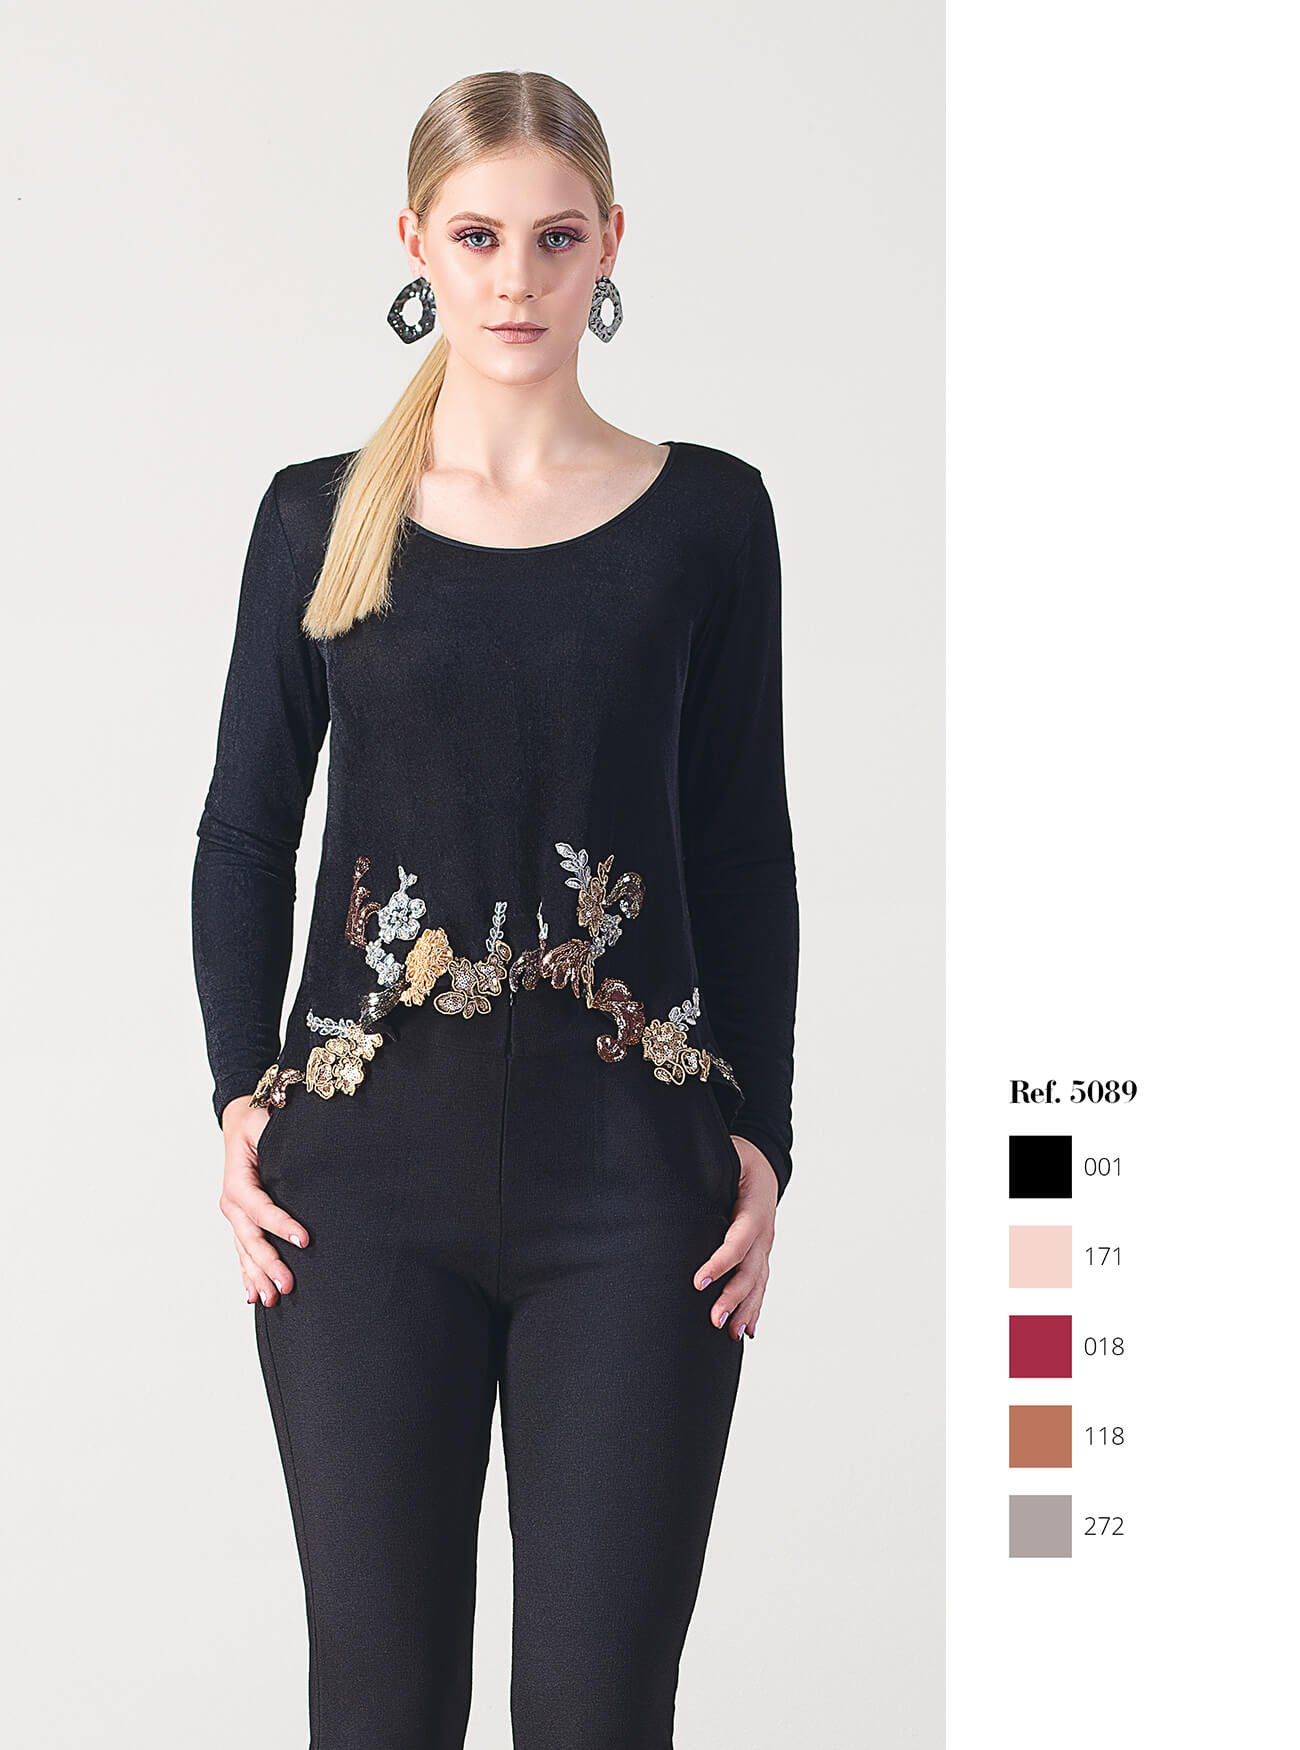 Blusa manga longa com bordados